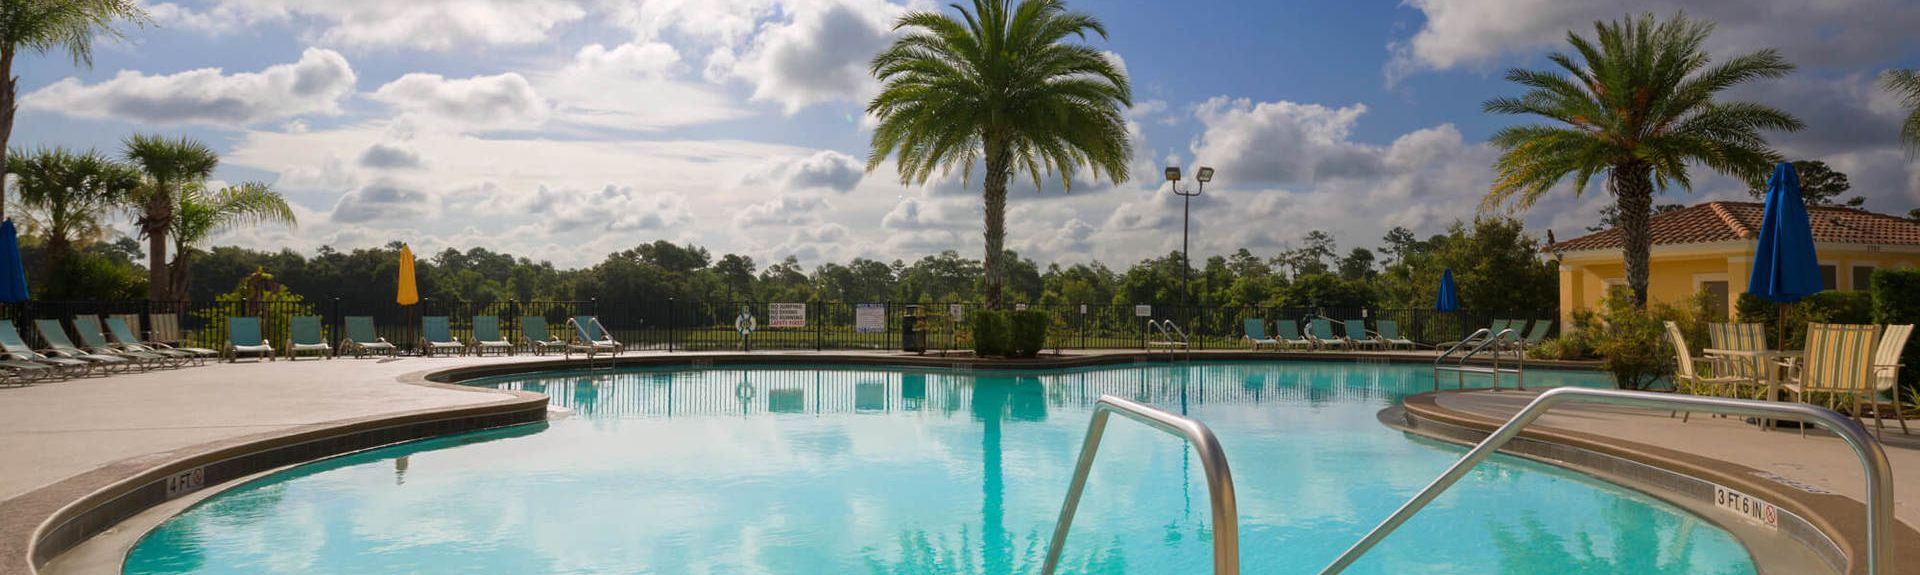 Oakwater, Kissimmee, Florida, United States of America